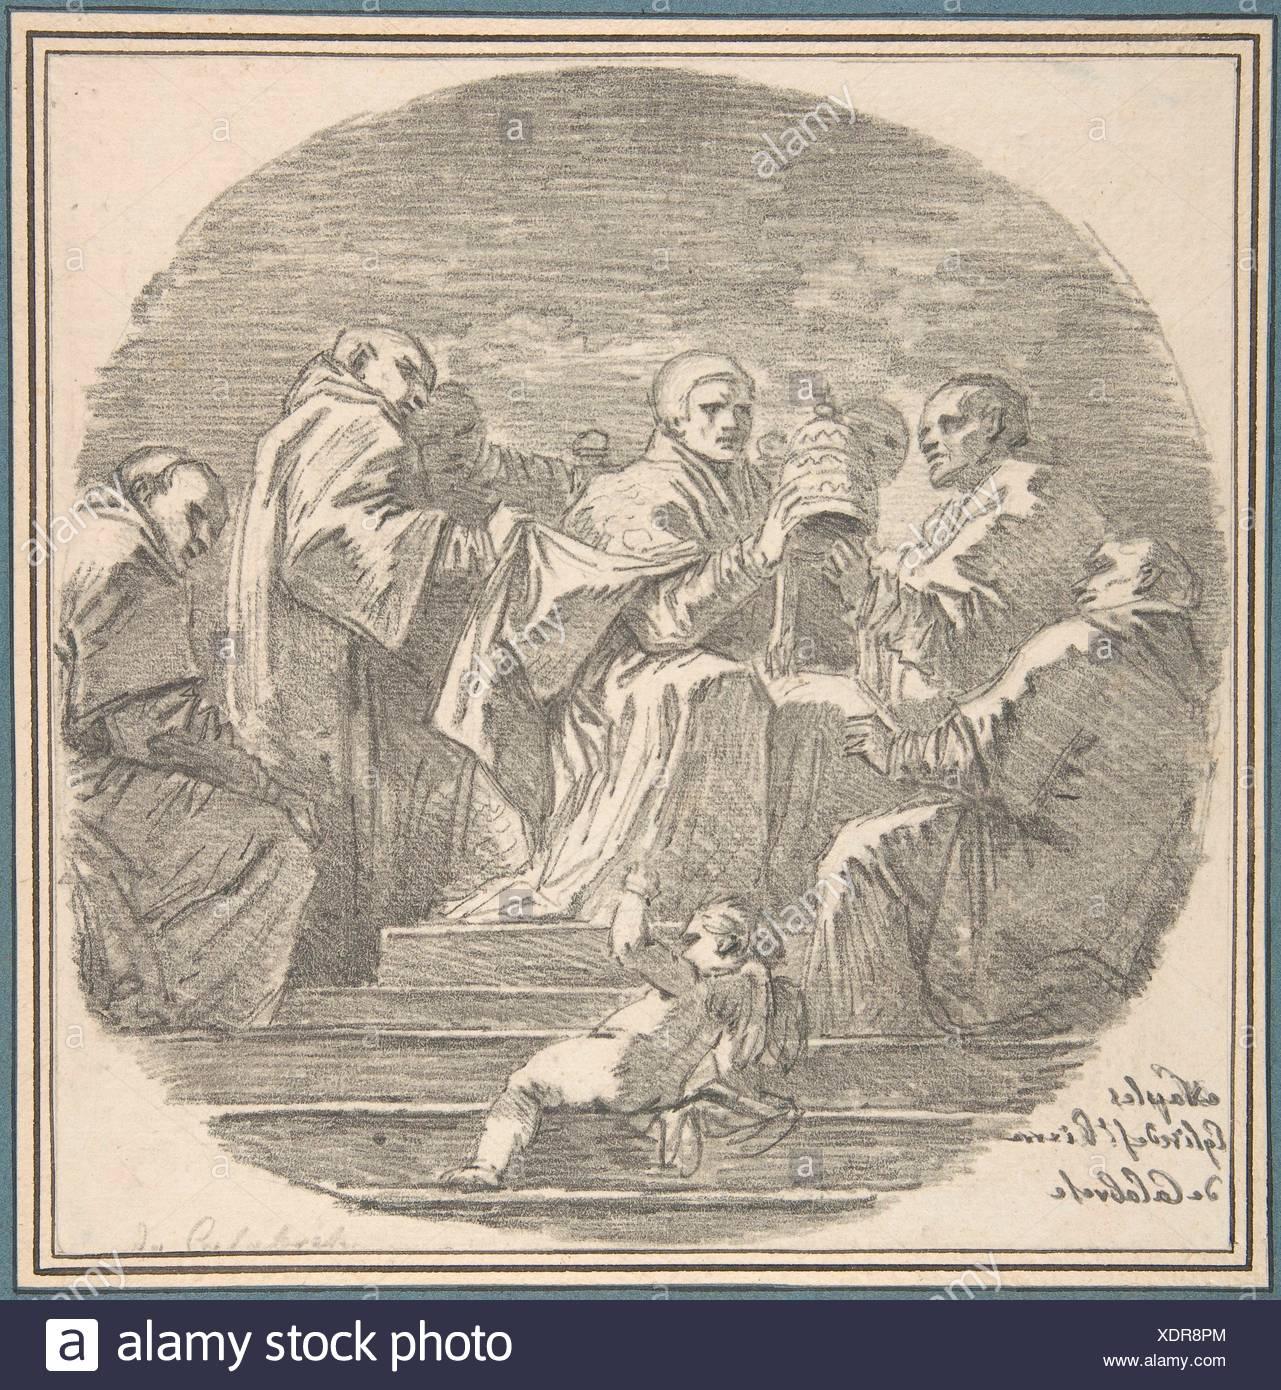 Saint Celestine V Renouncing the Papacy, after Mattia Preti. Artist: Jean Honoré Fragonard (French, Grasse 1732-1806 Paris); Artist: After Mattia - Stock Image